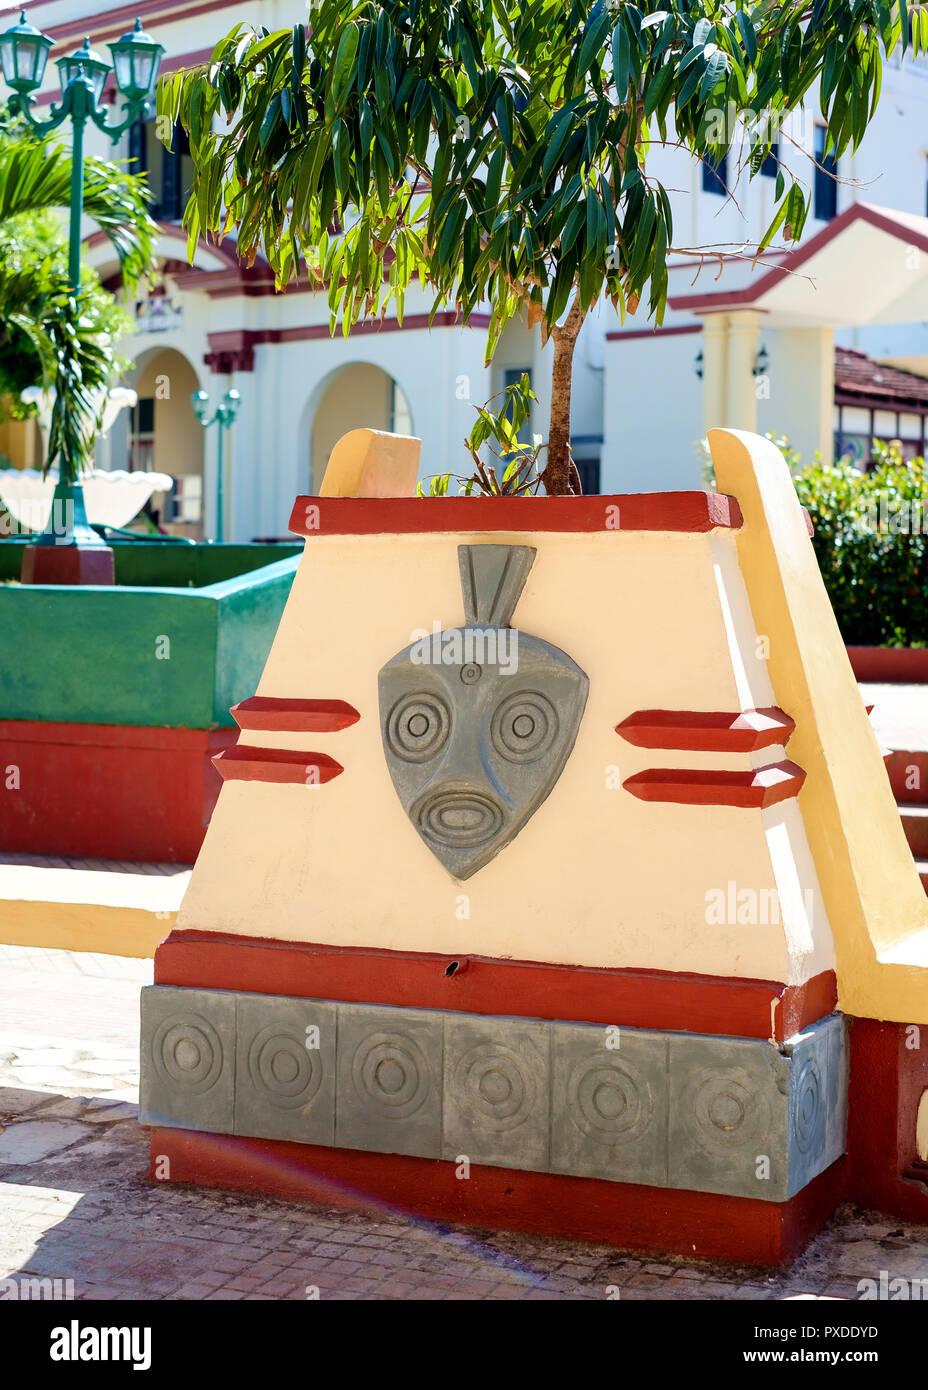 Decorative Street Furniture, Baracoa, Cuba - Stock Image